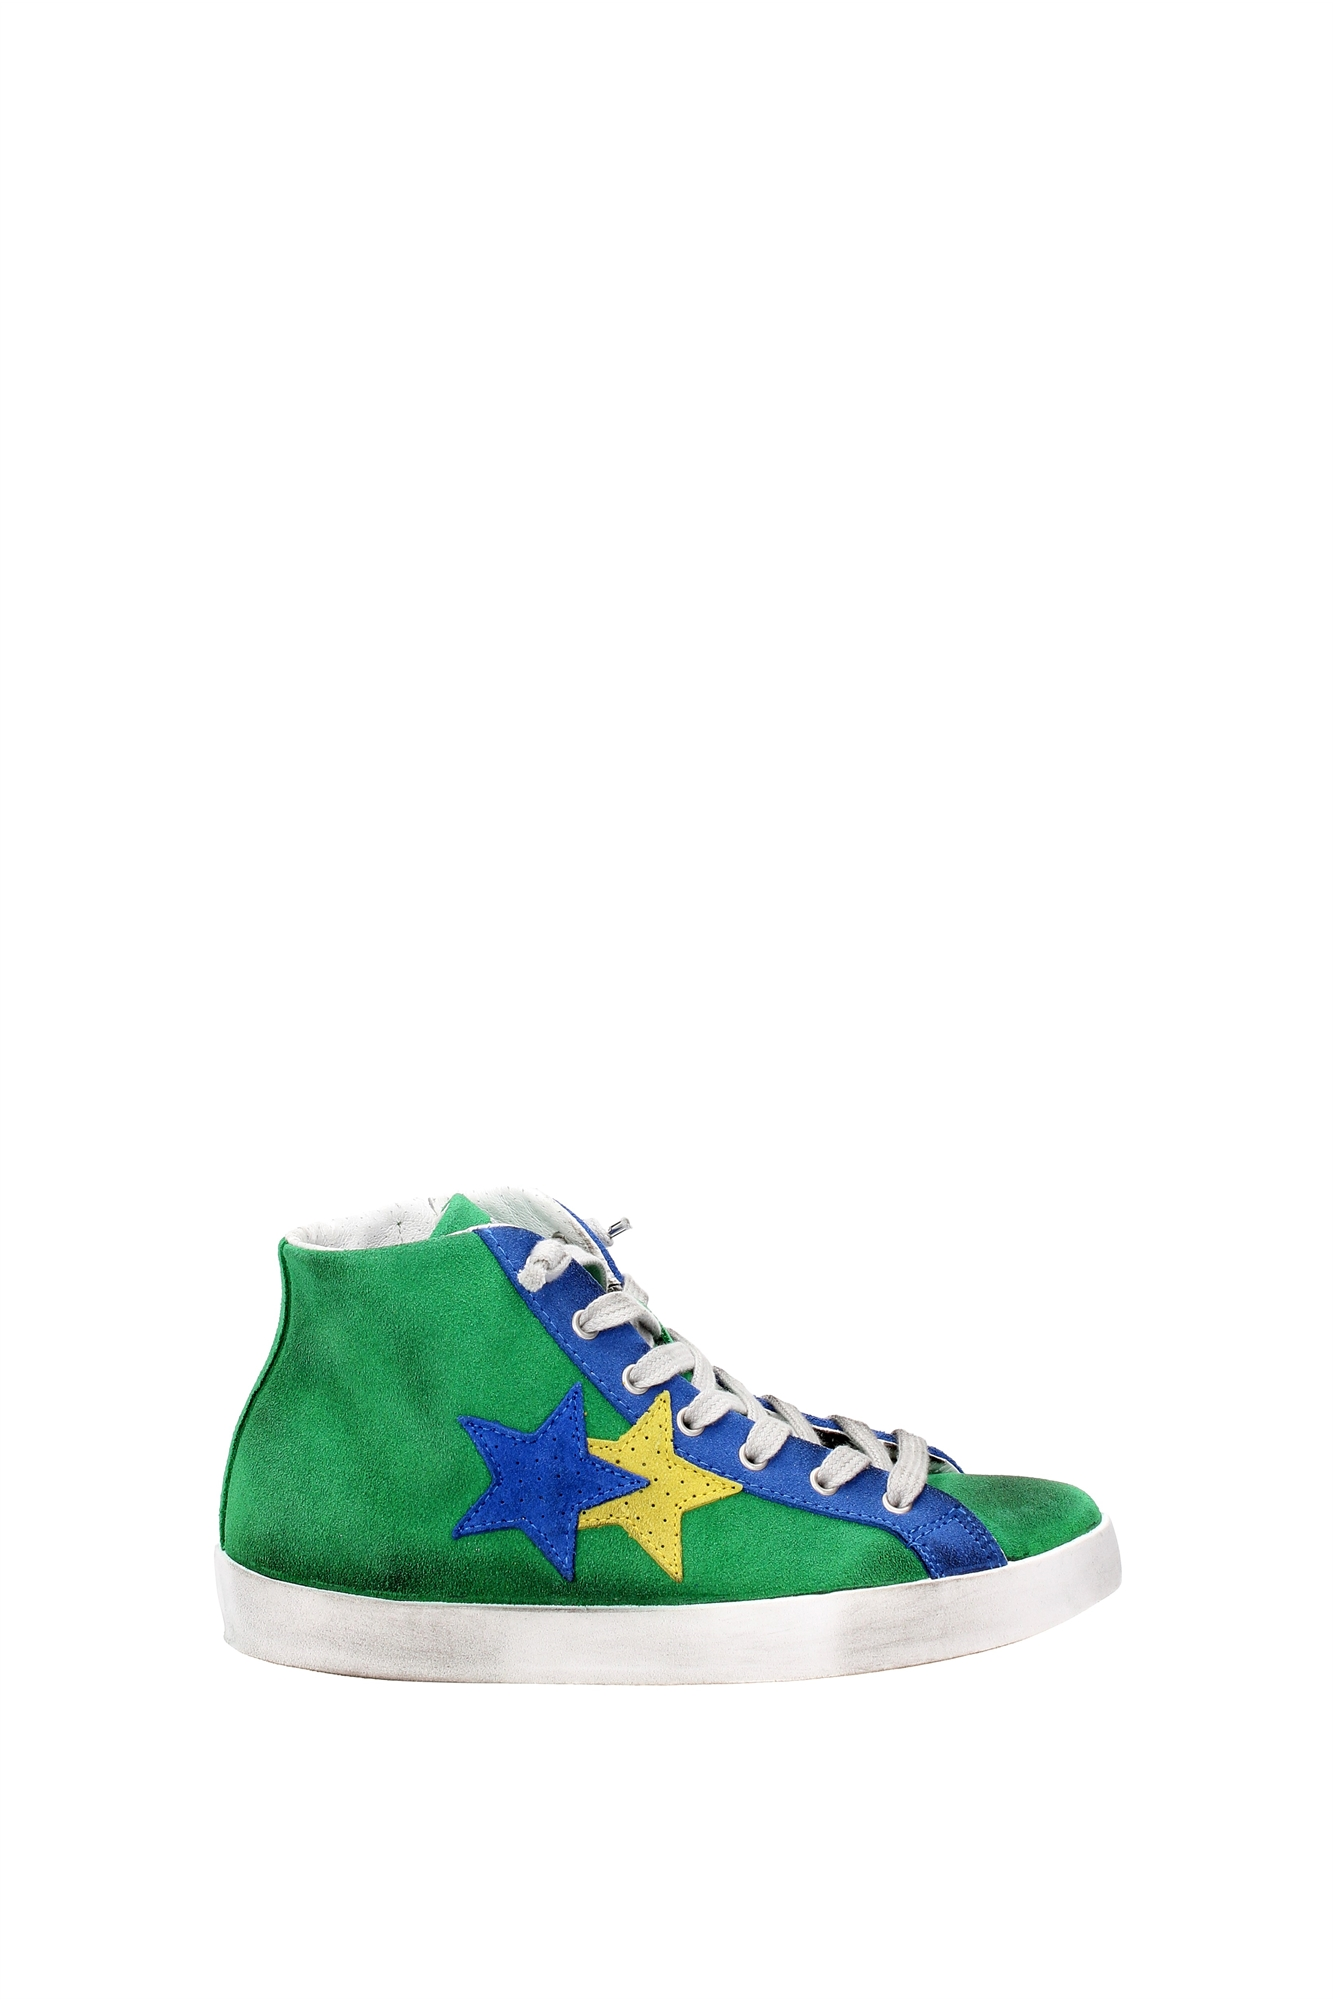 Sneakers 2star 2star Sneakers Damen -  (2SB626VERDEAZZURRO) 837c75